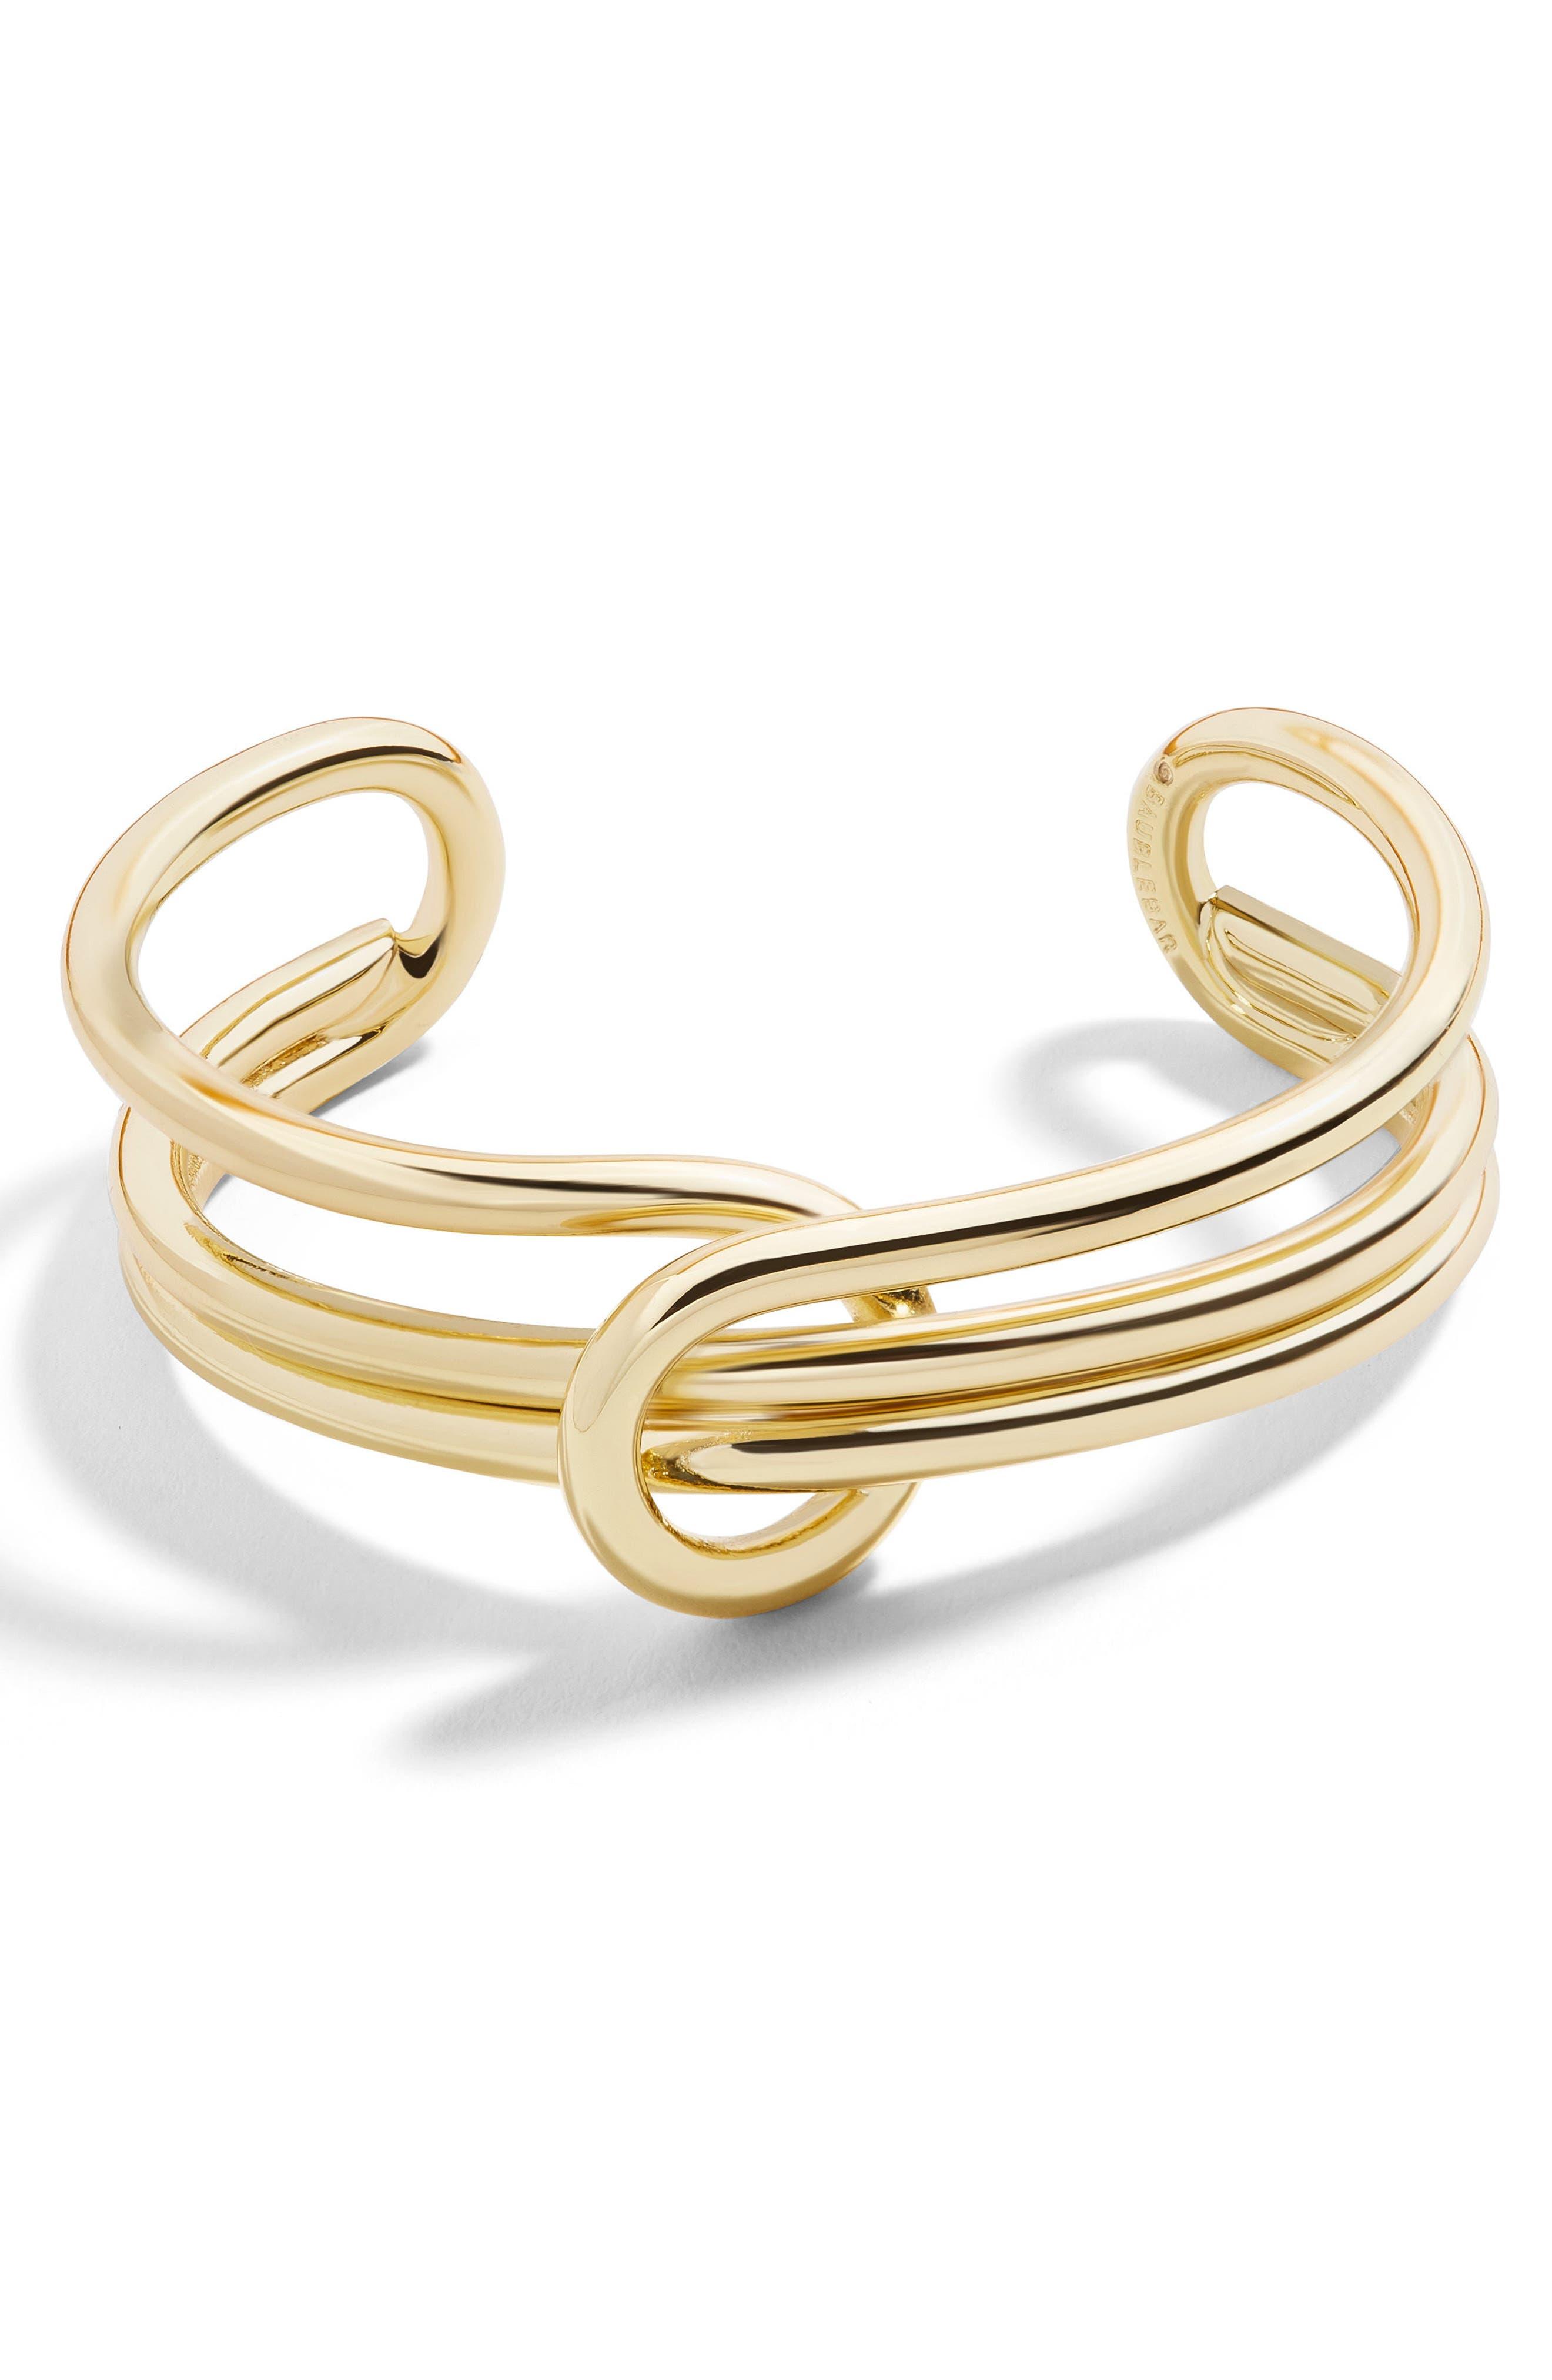 BaubleBar Shyanna Cuff Bracelet